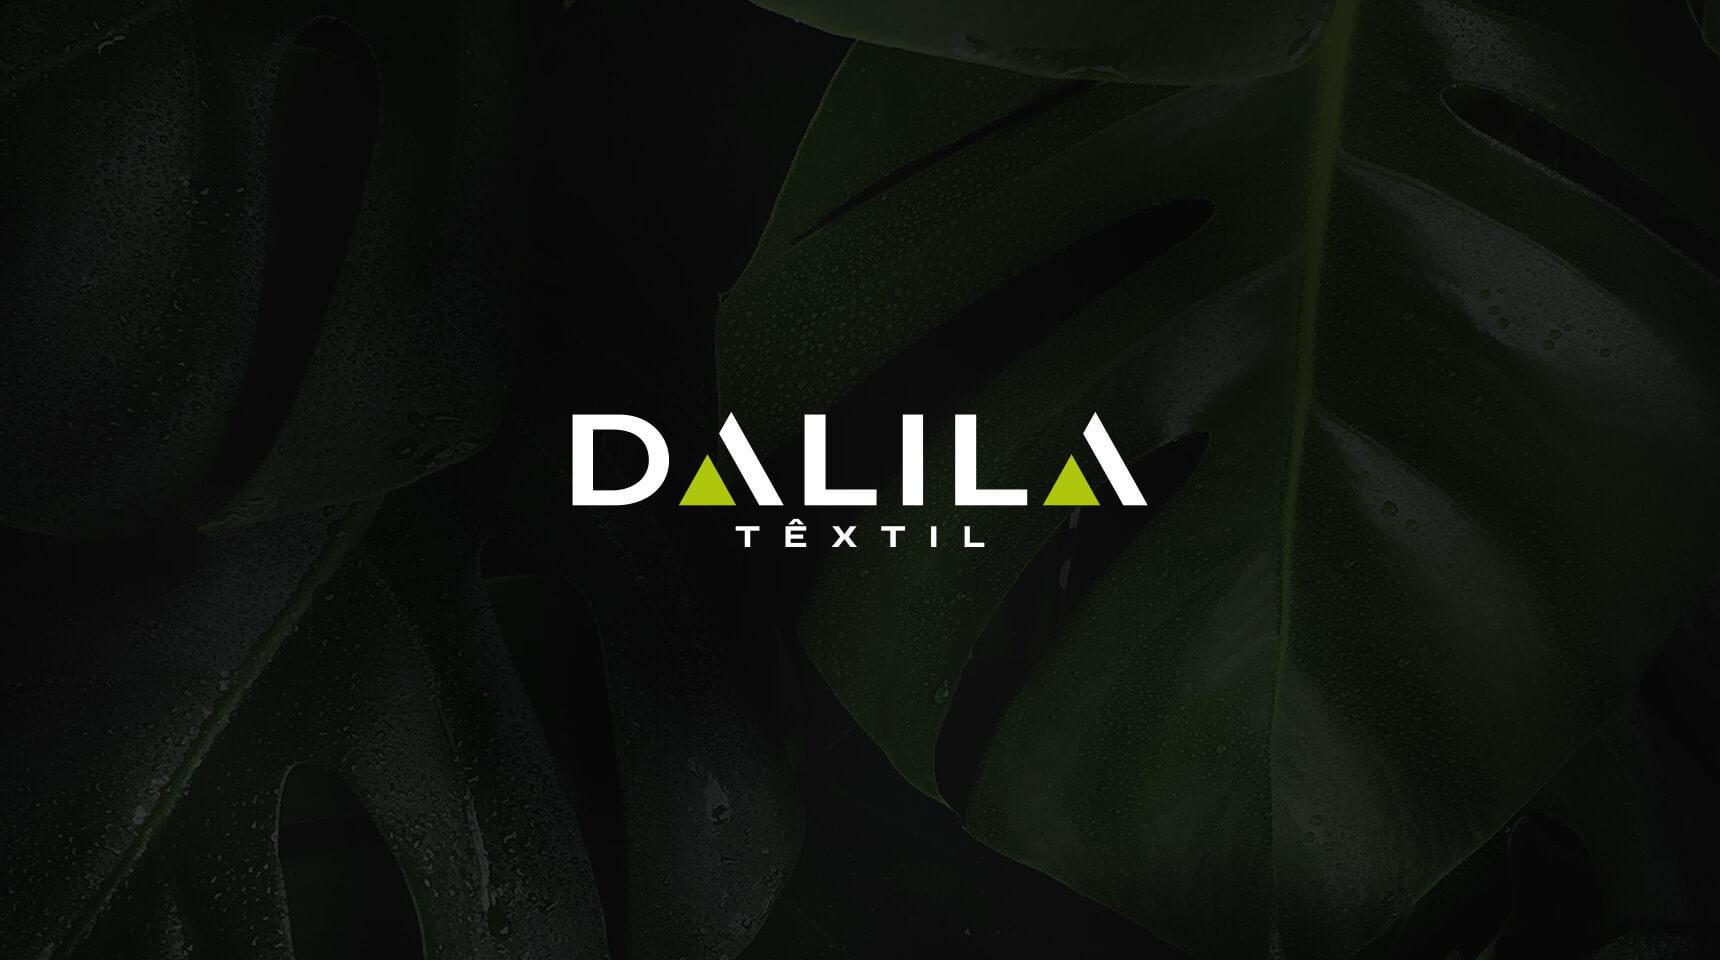 firmorama_dalila_02